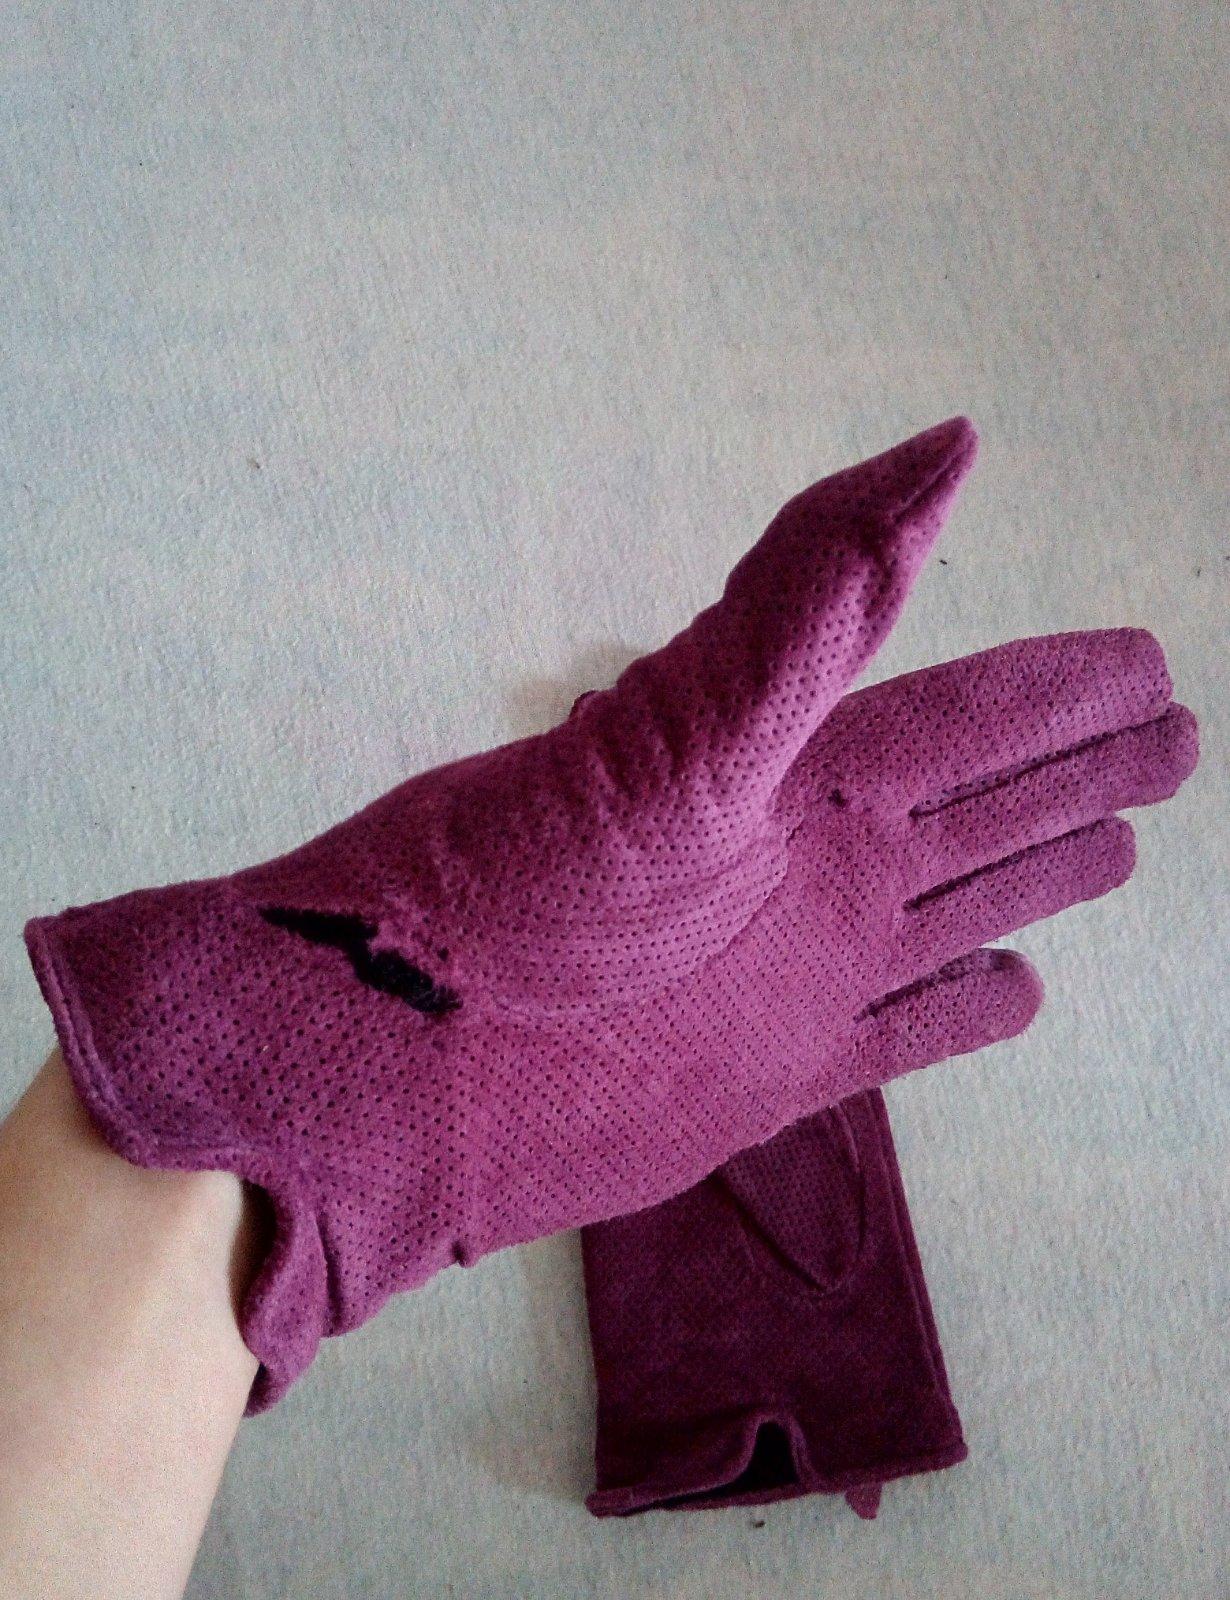 Fialové kožené rukavice Reserved S - Obrázok č. 4